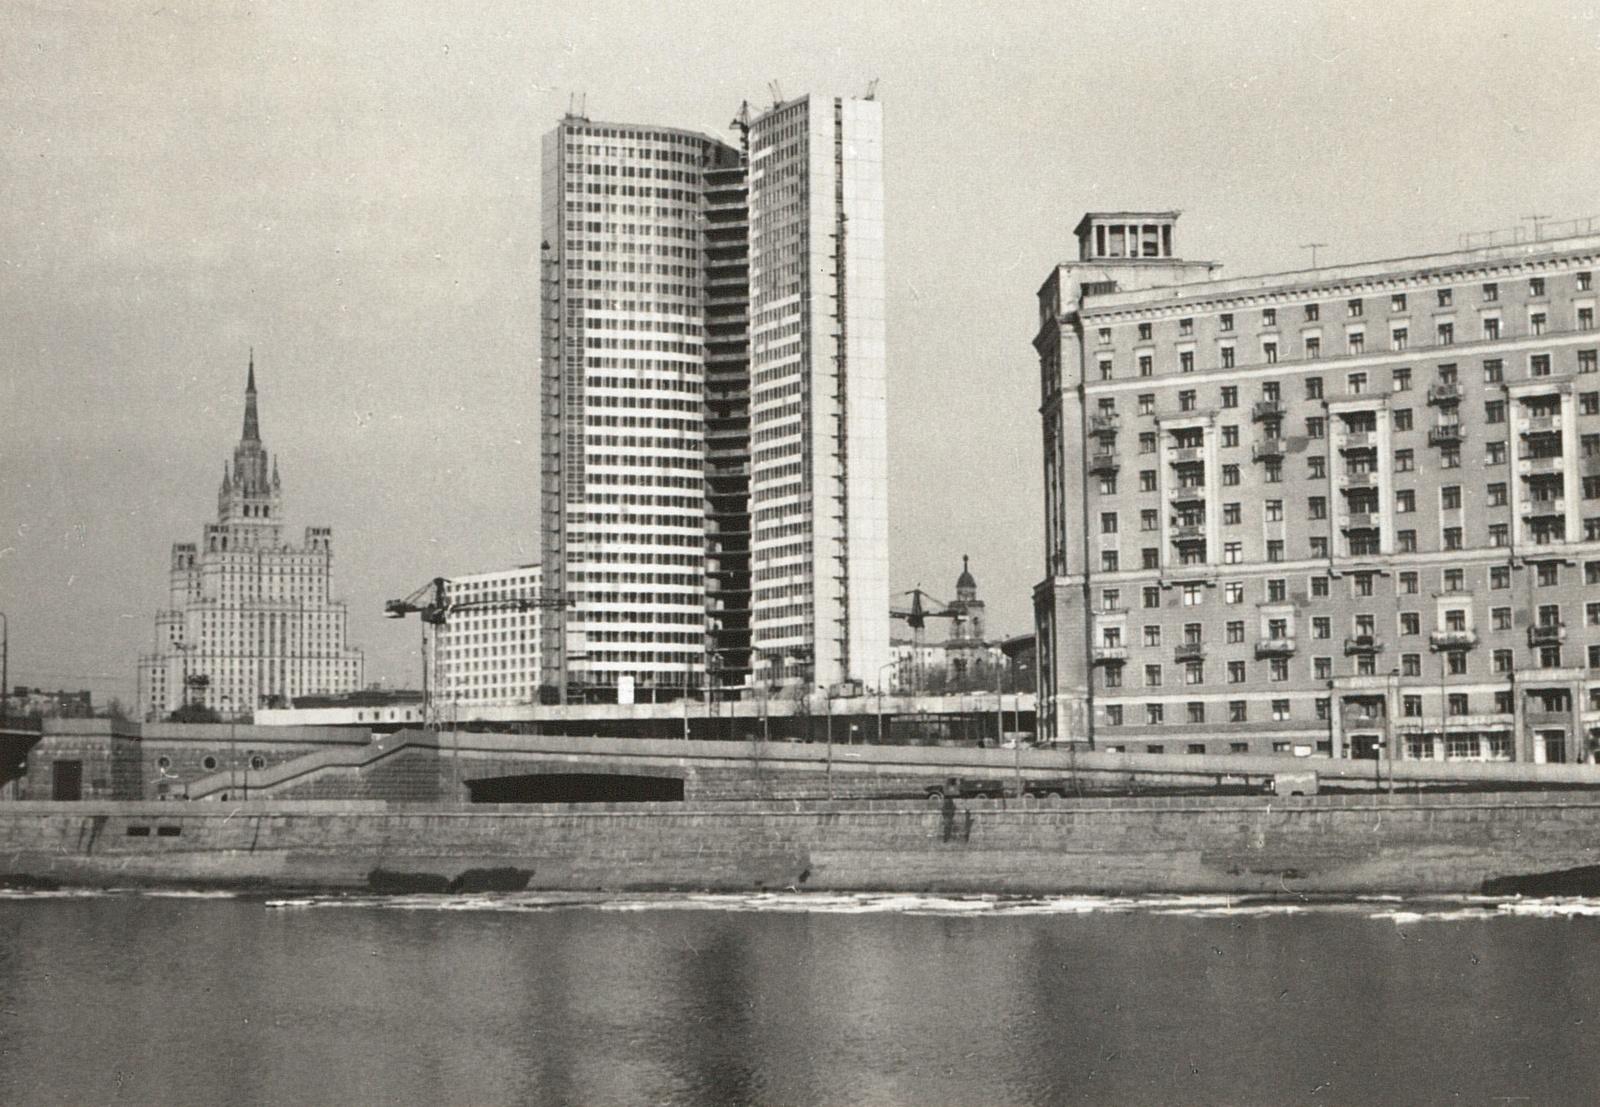 Москва. Вид с моста на Москву-реку и Новый Арбат. 1967